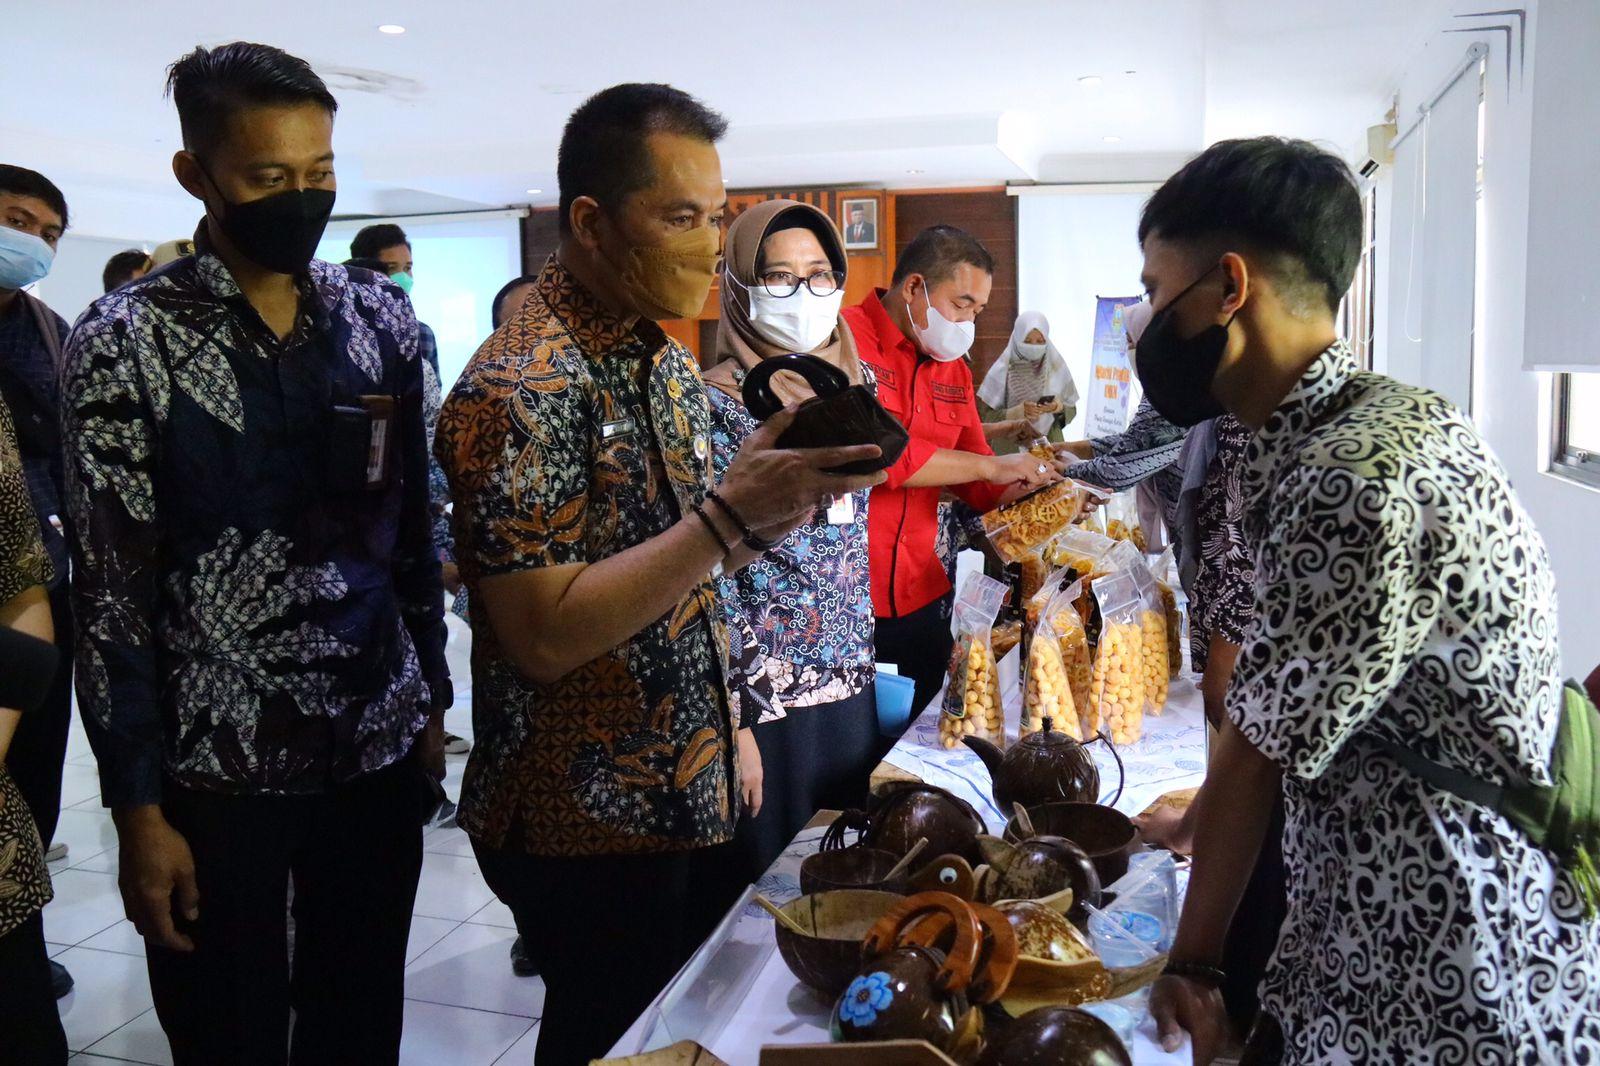 TINJAU: Bupati Kudus HM Hartopo sedang melihat-lihat produk UMKM yang ada di Kabupaten Kudus, Rabu (29/9)/Lingkar.co